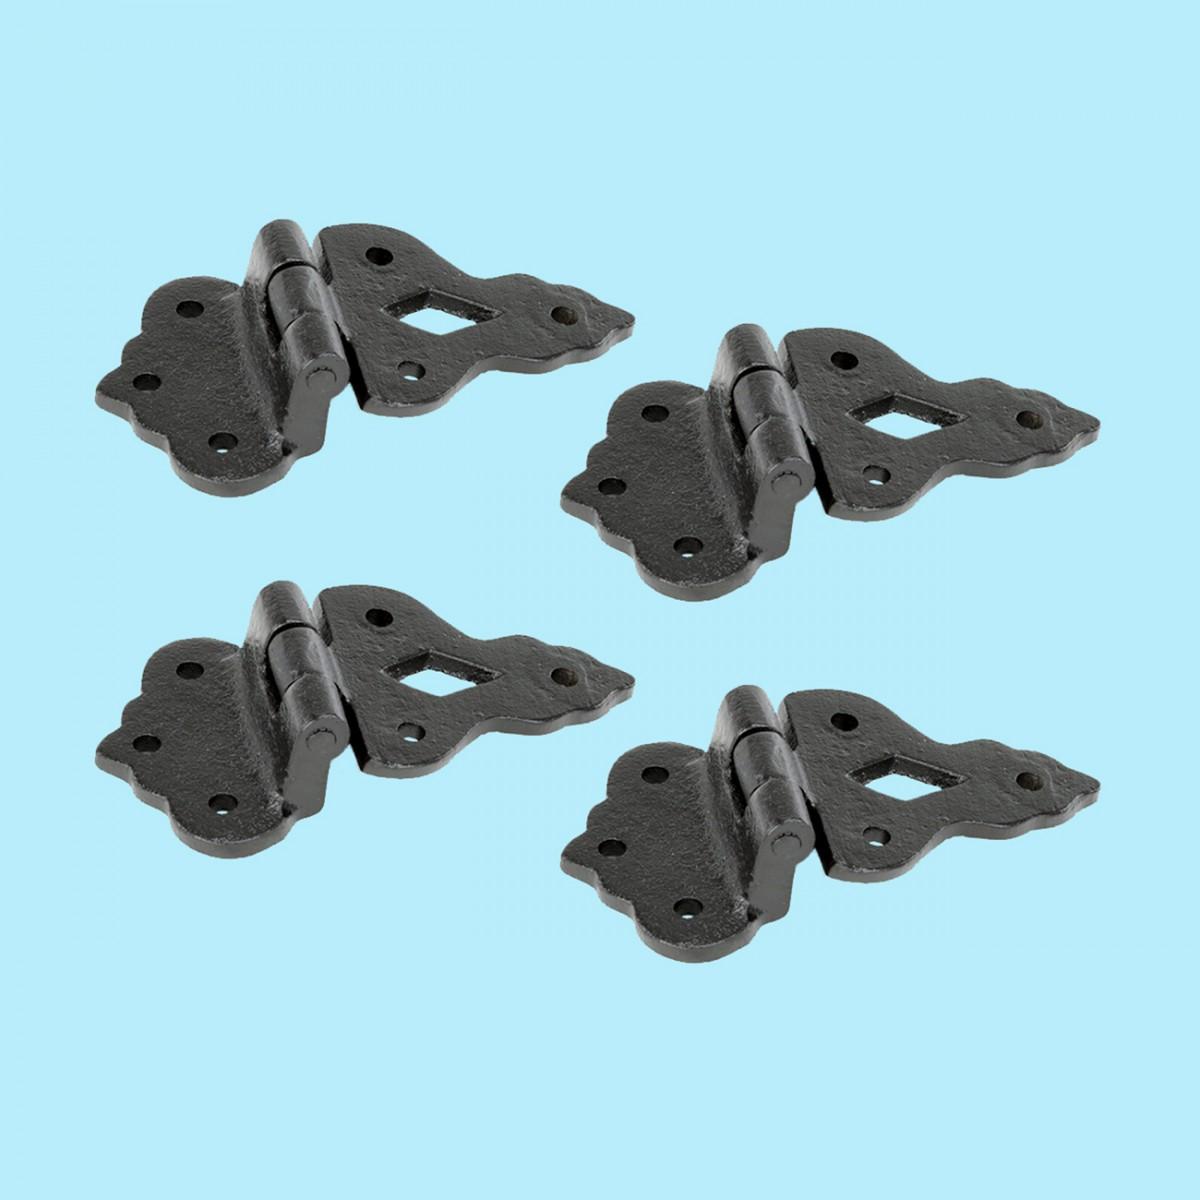 Hoosier Black Iron Cabinet Hinge 3/8 Offset 3 1/2 W Pack Of 4